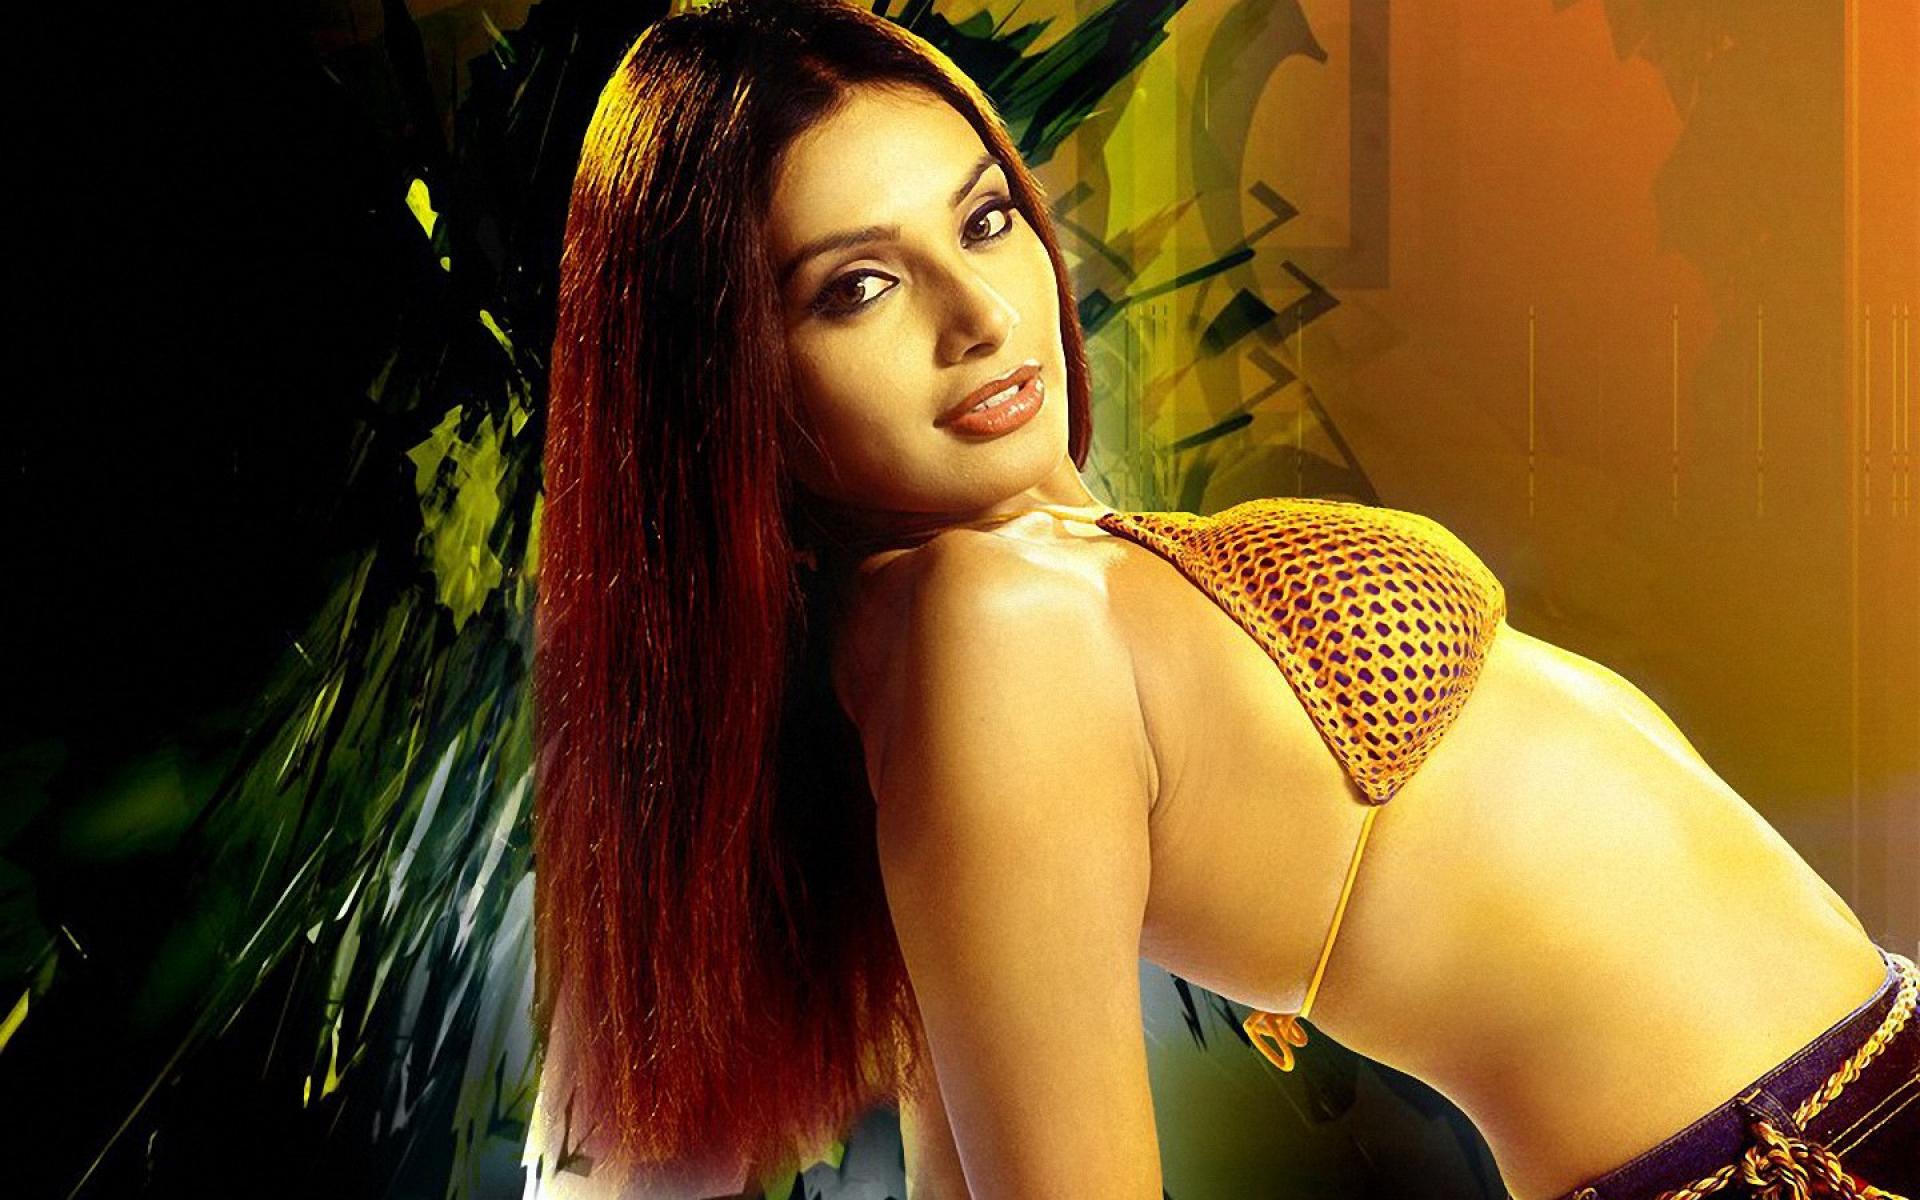 Bipasha basu hot and sexy photos